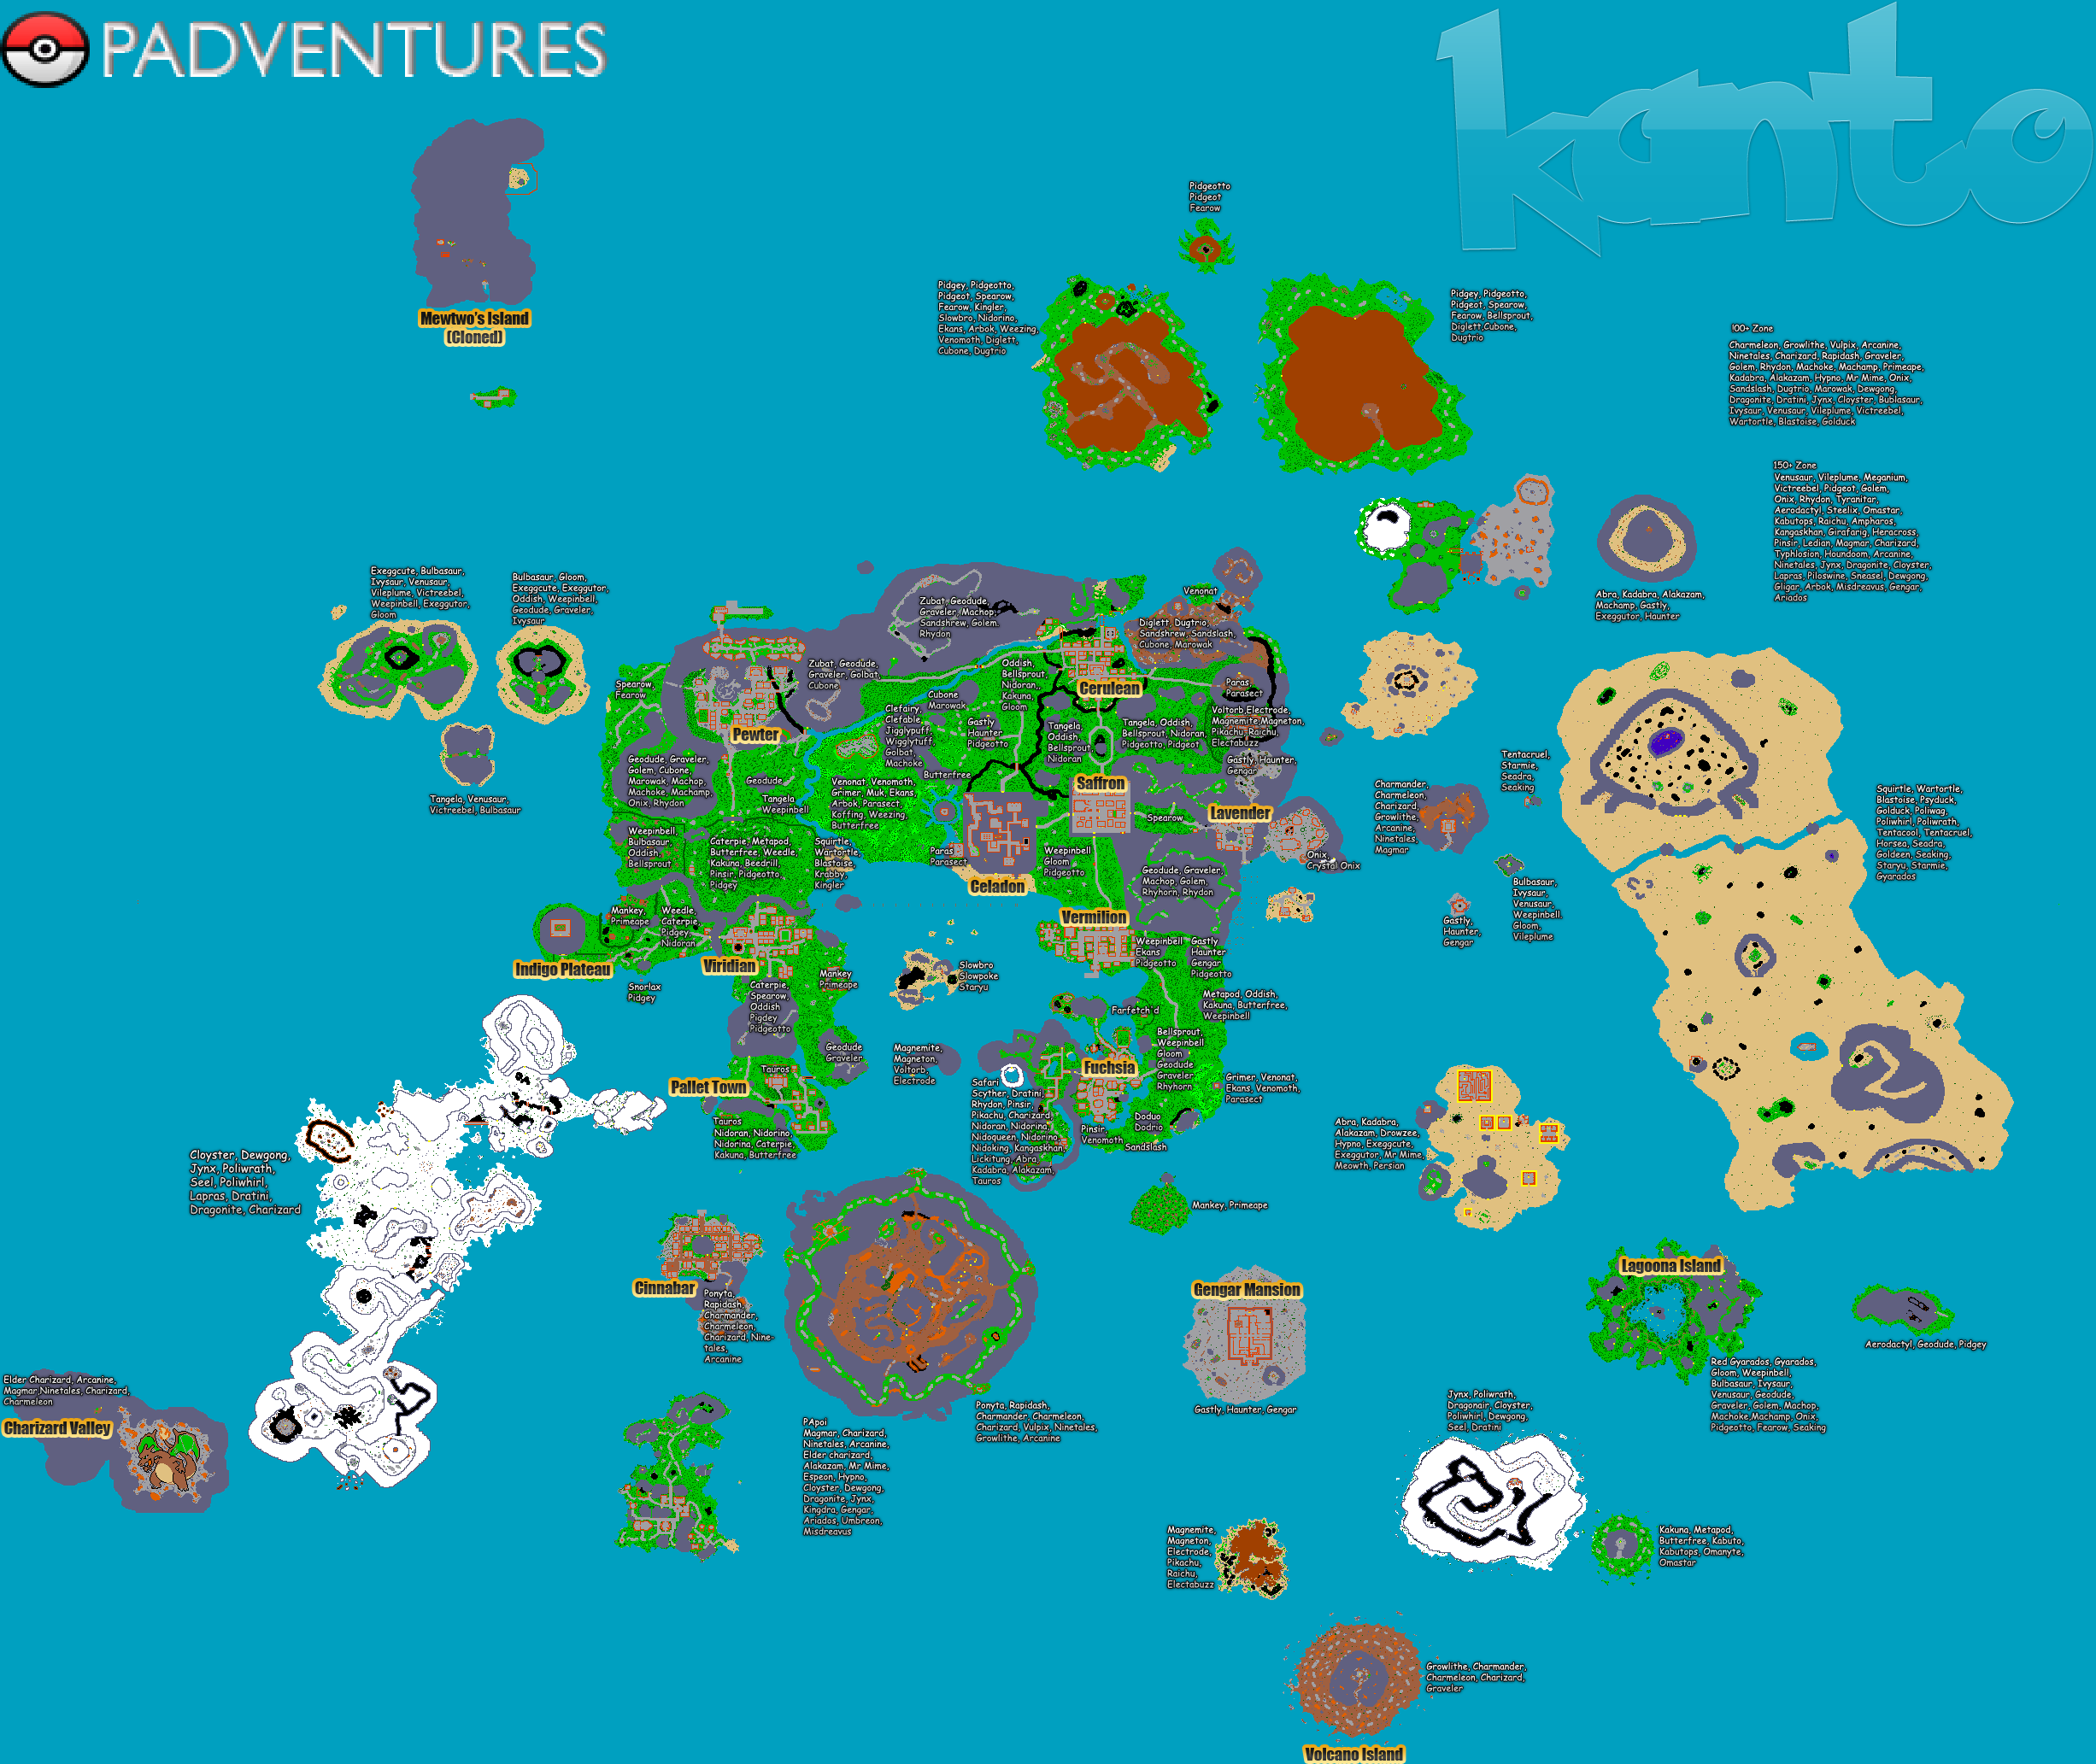 Tibia World Map.Padventures Best Pokemon Online Server Poke Tibia